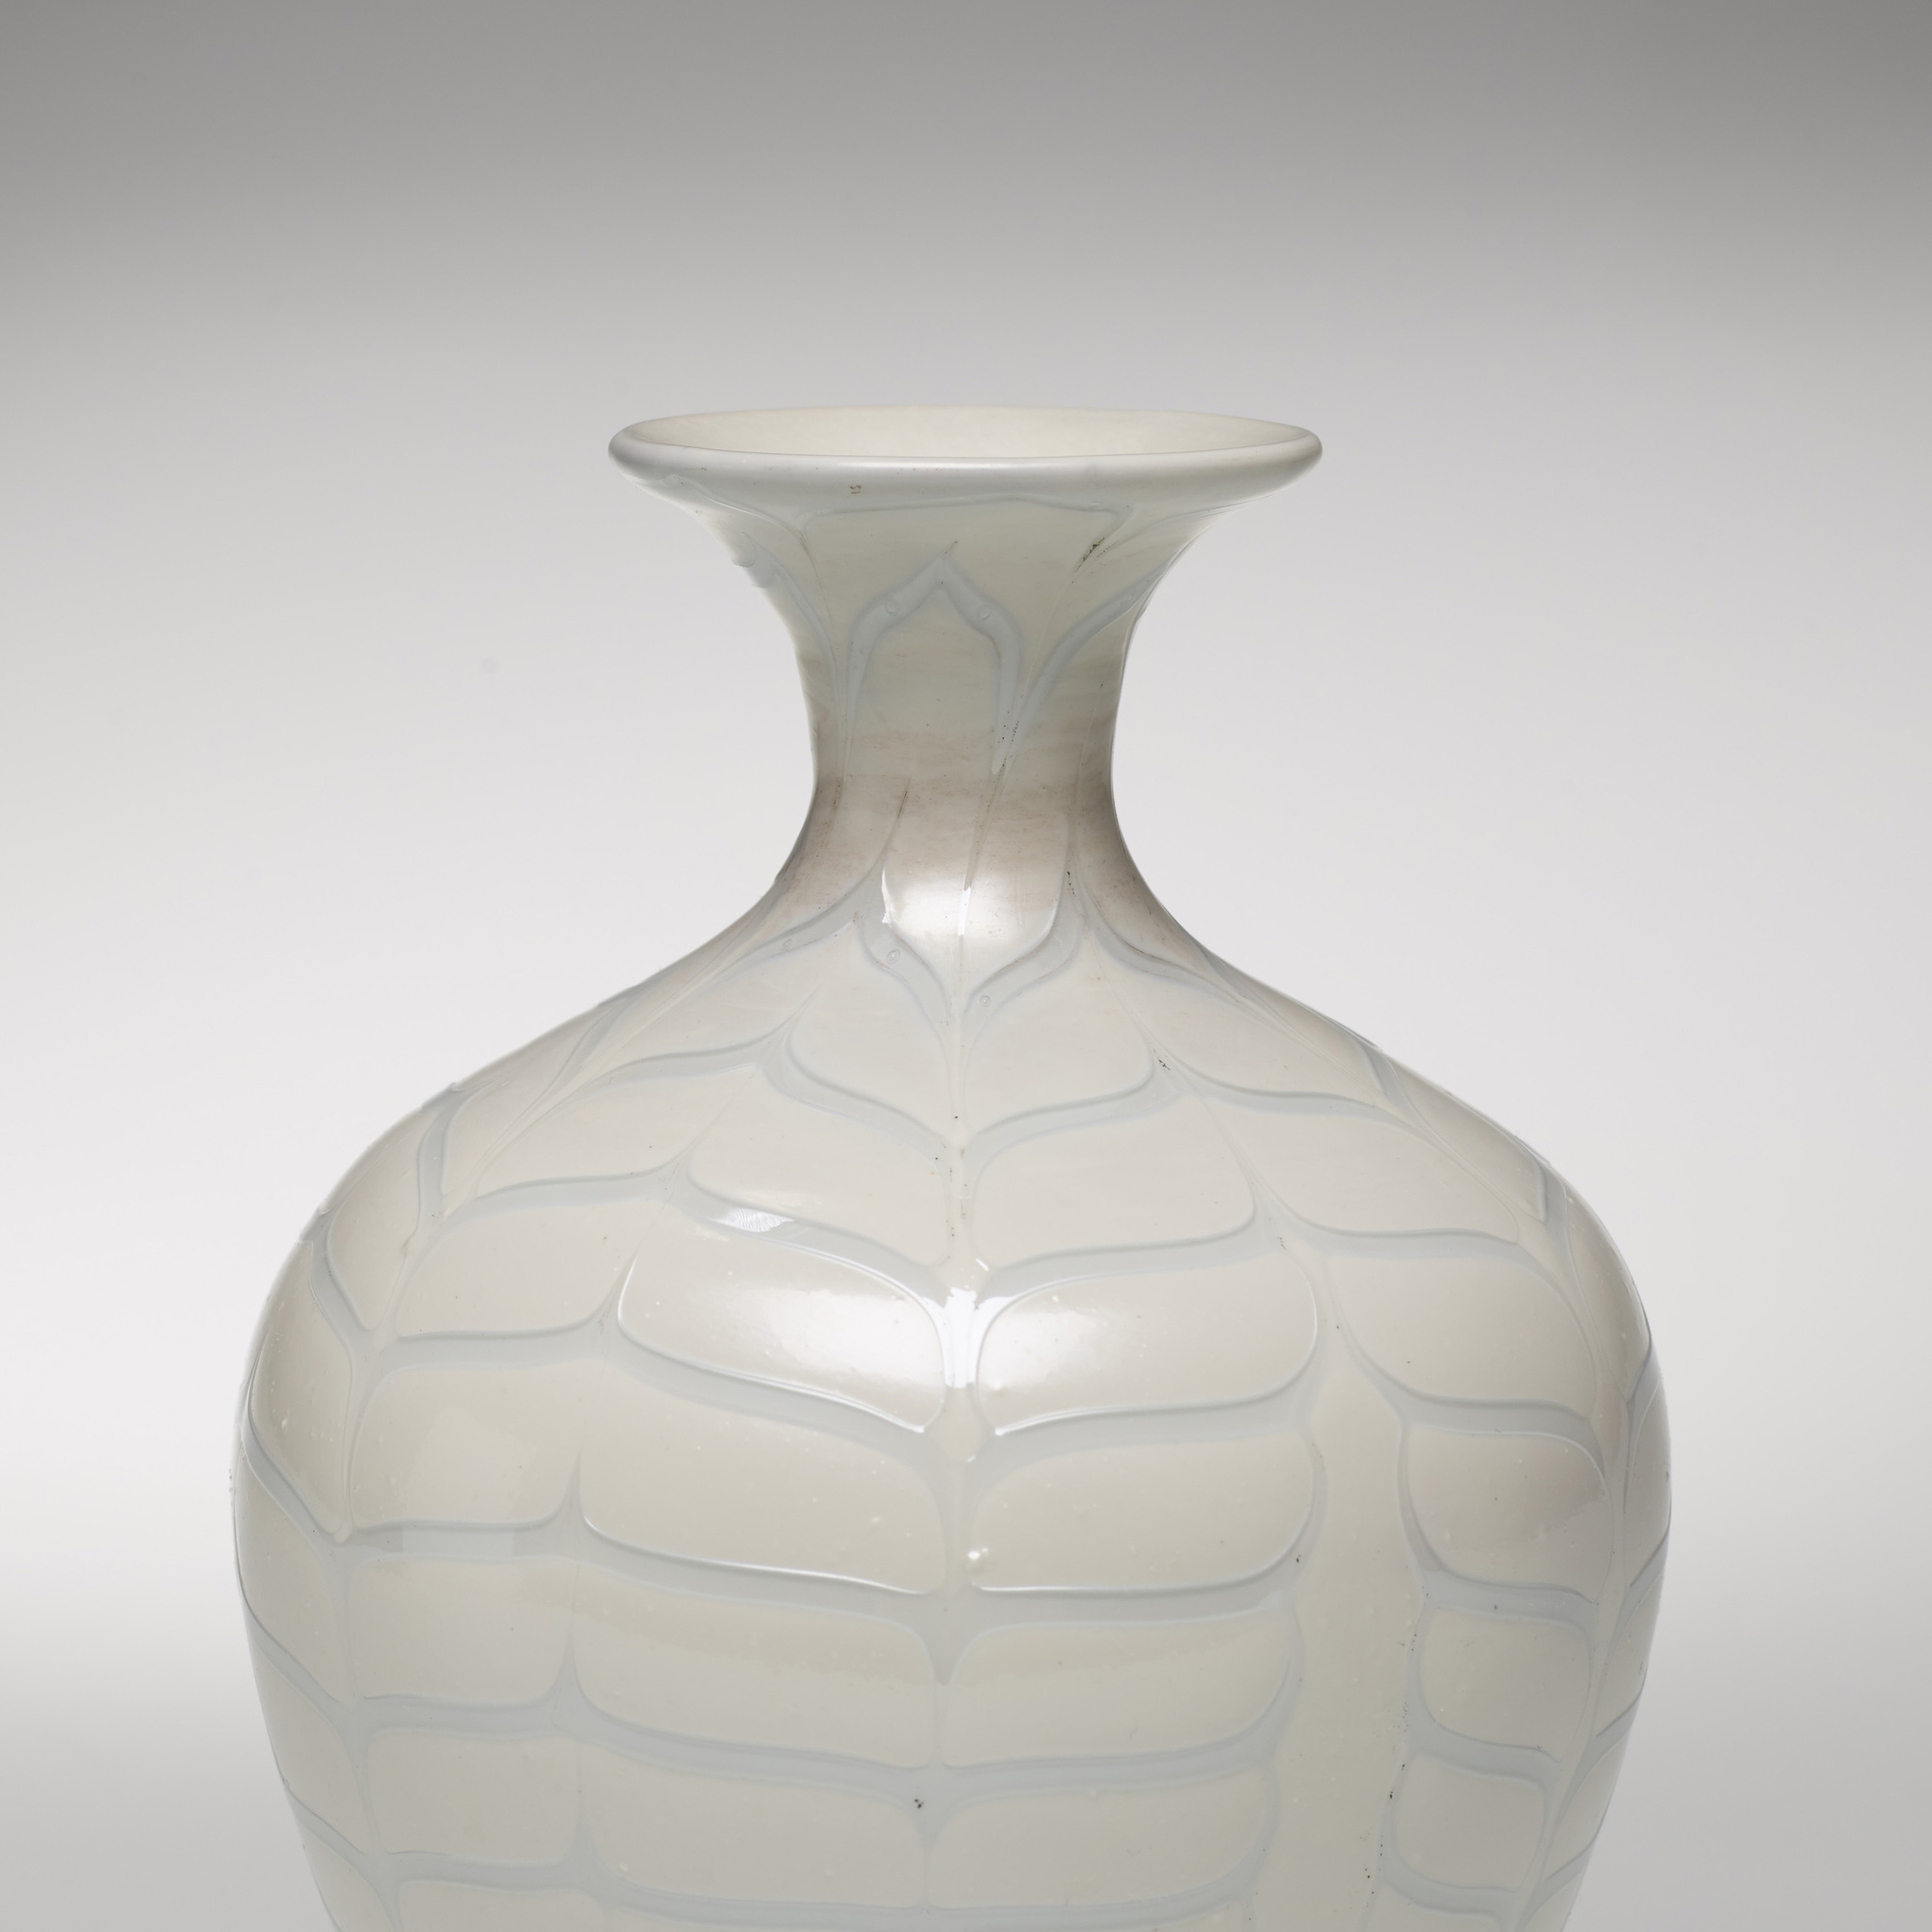 193: Carlo Scarpa / Fenici vase (2 of 3)